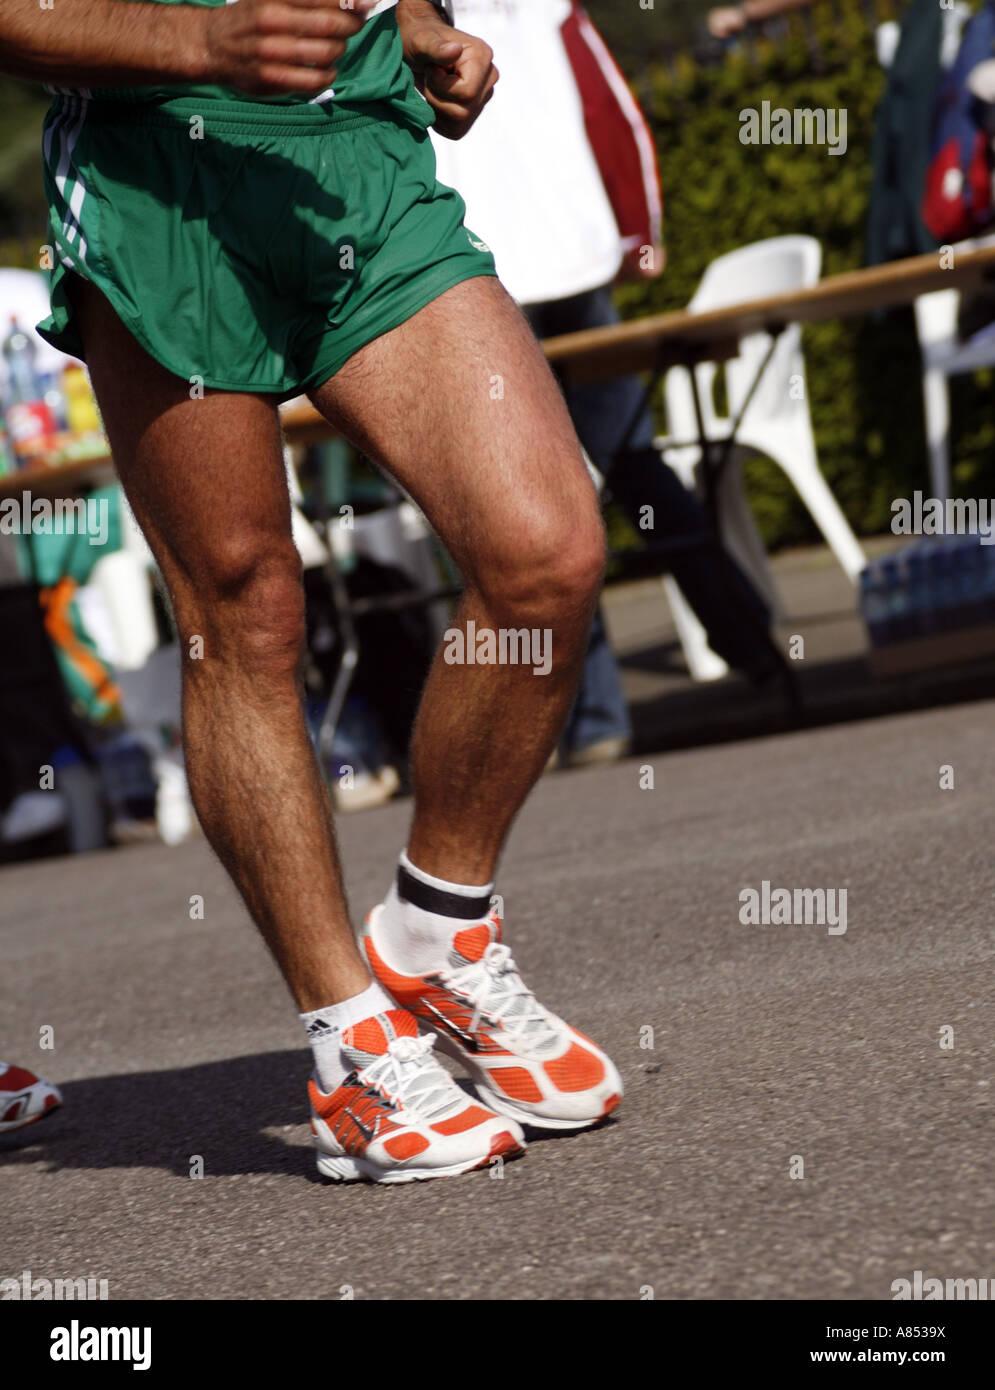 7th European Cup Race Walking Championship Leamington Spa Warwickshire 20th May 2007 - Stock Image